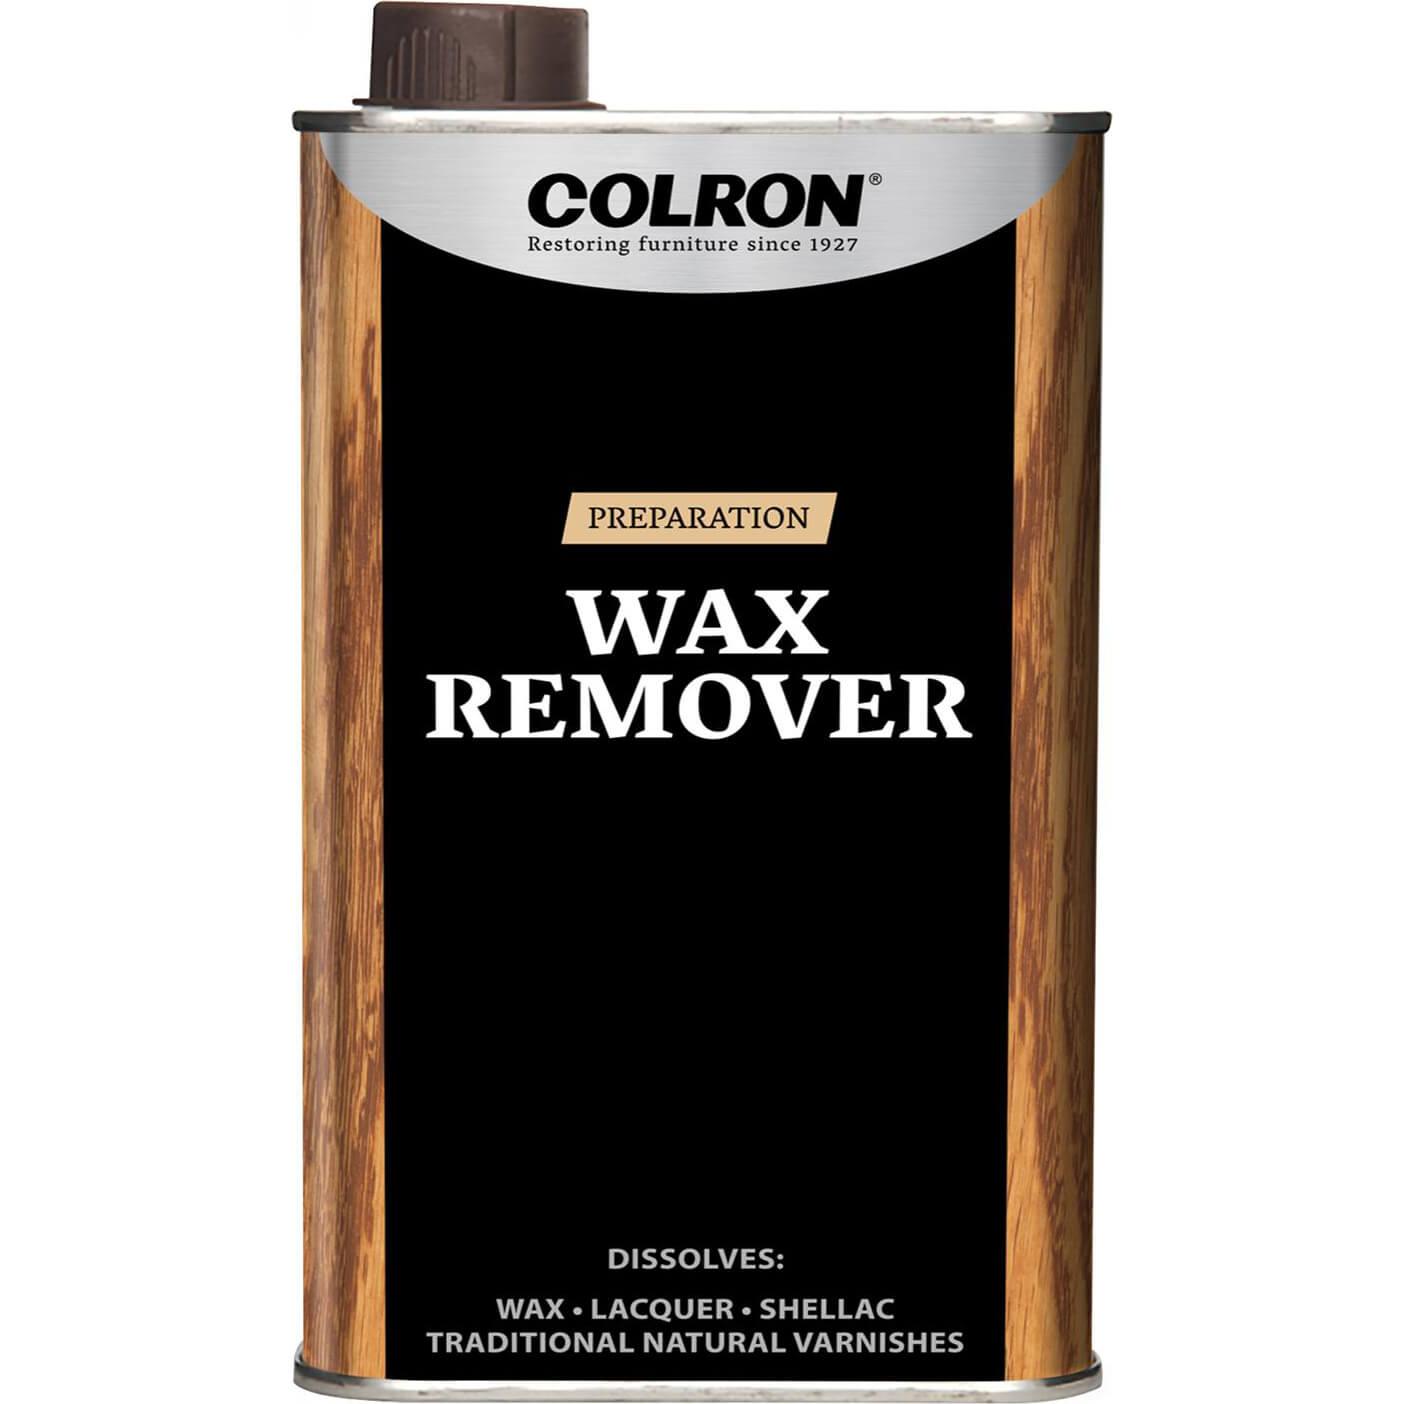 Ronseal colron wood dye geo medium oak 500ml for Wood floor wax remover